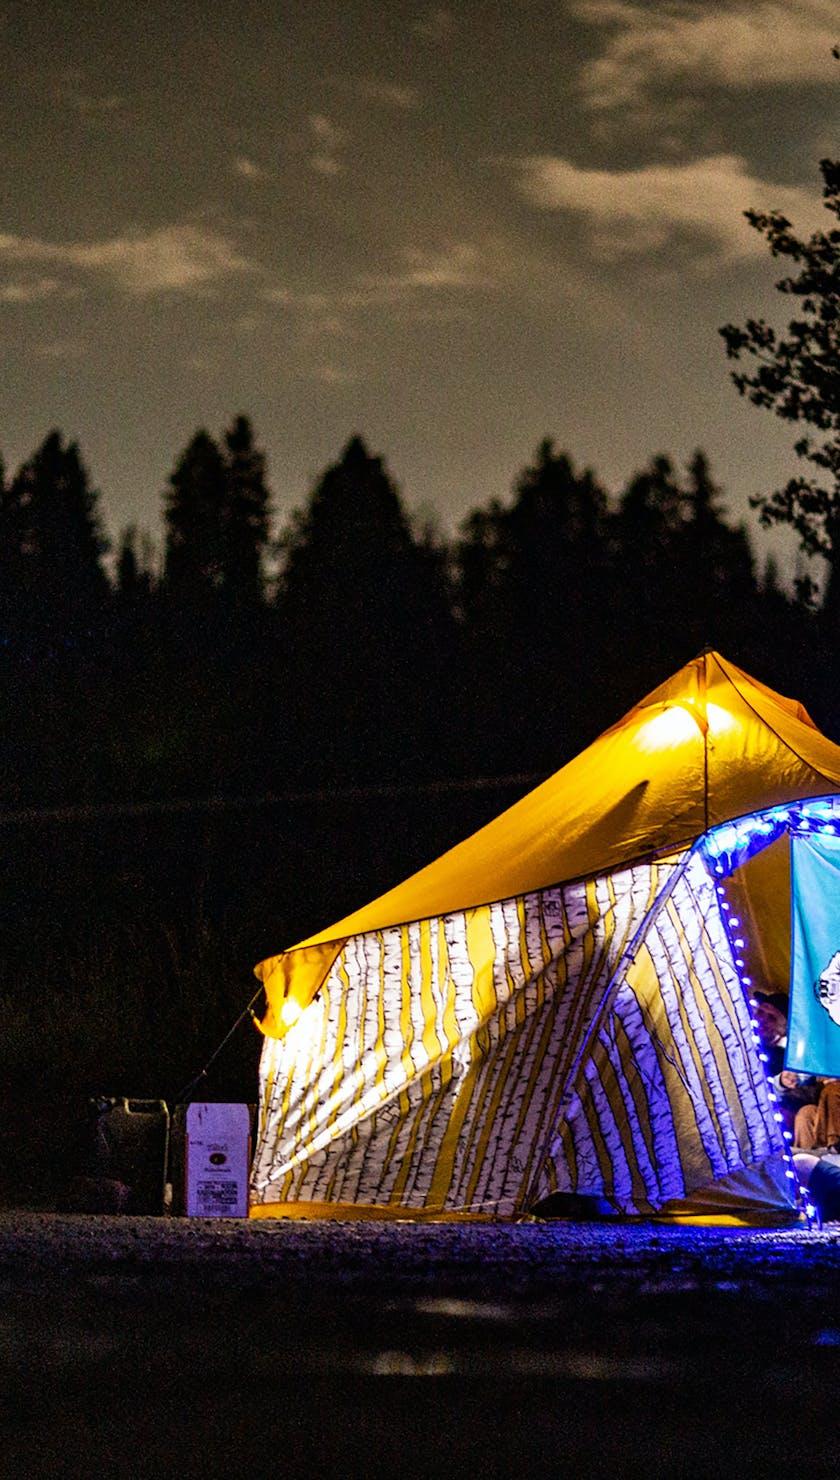 Durango Gathering 21 - Tents